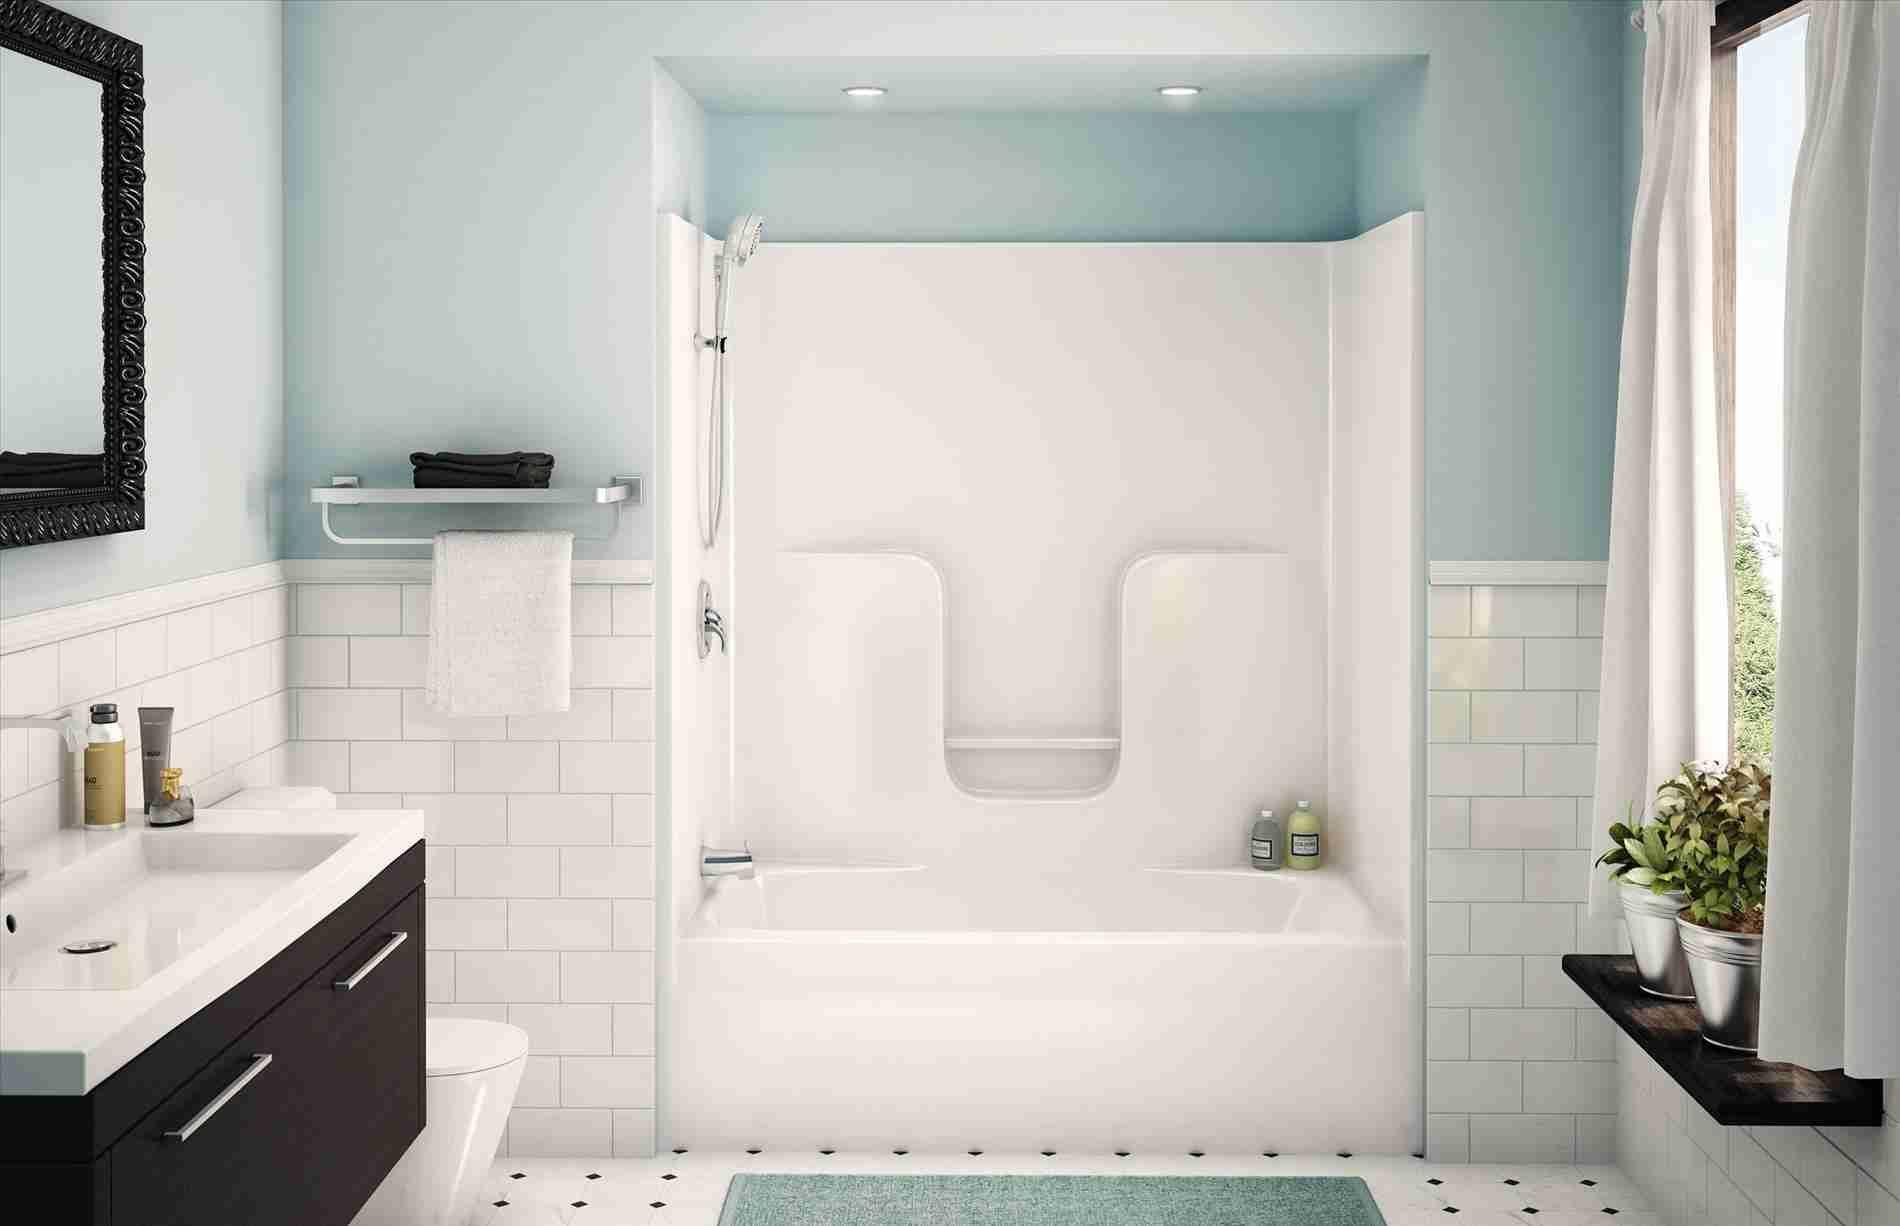 Trending Bathroom Designs New Post Trendingfiberglass Bathtub Shower Combovisitentermp3